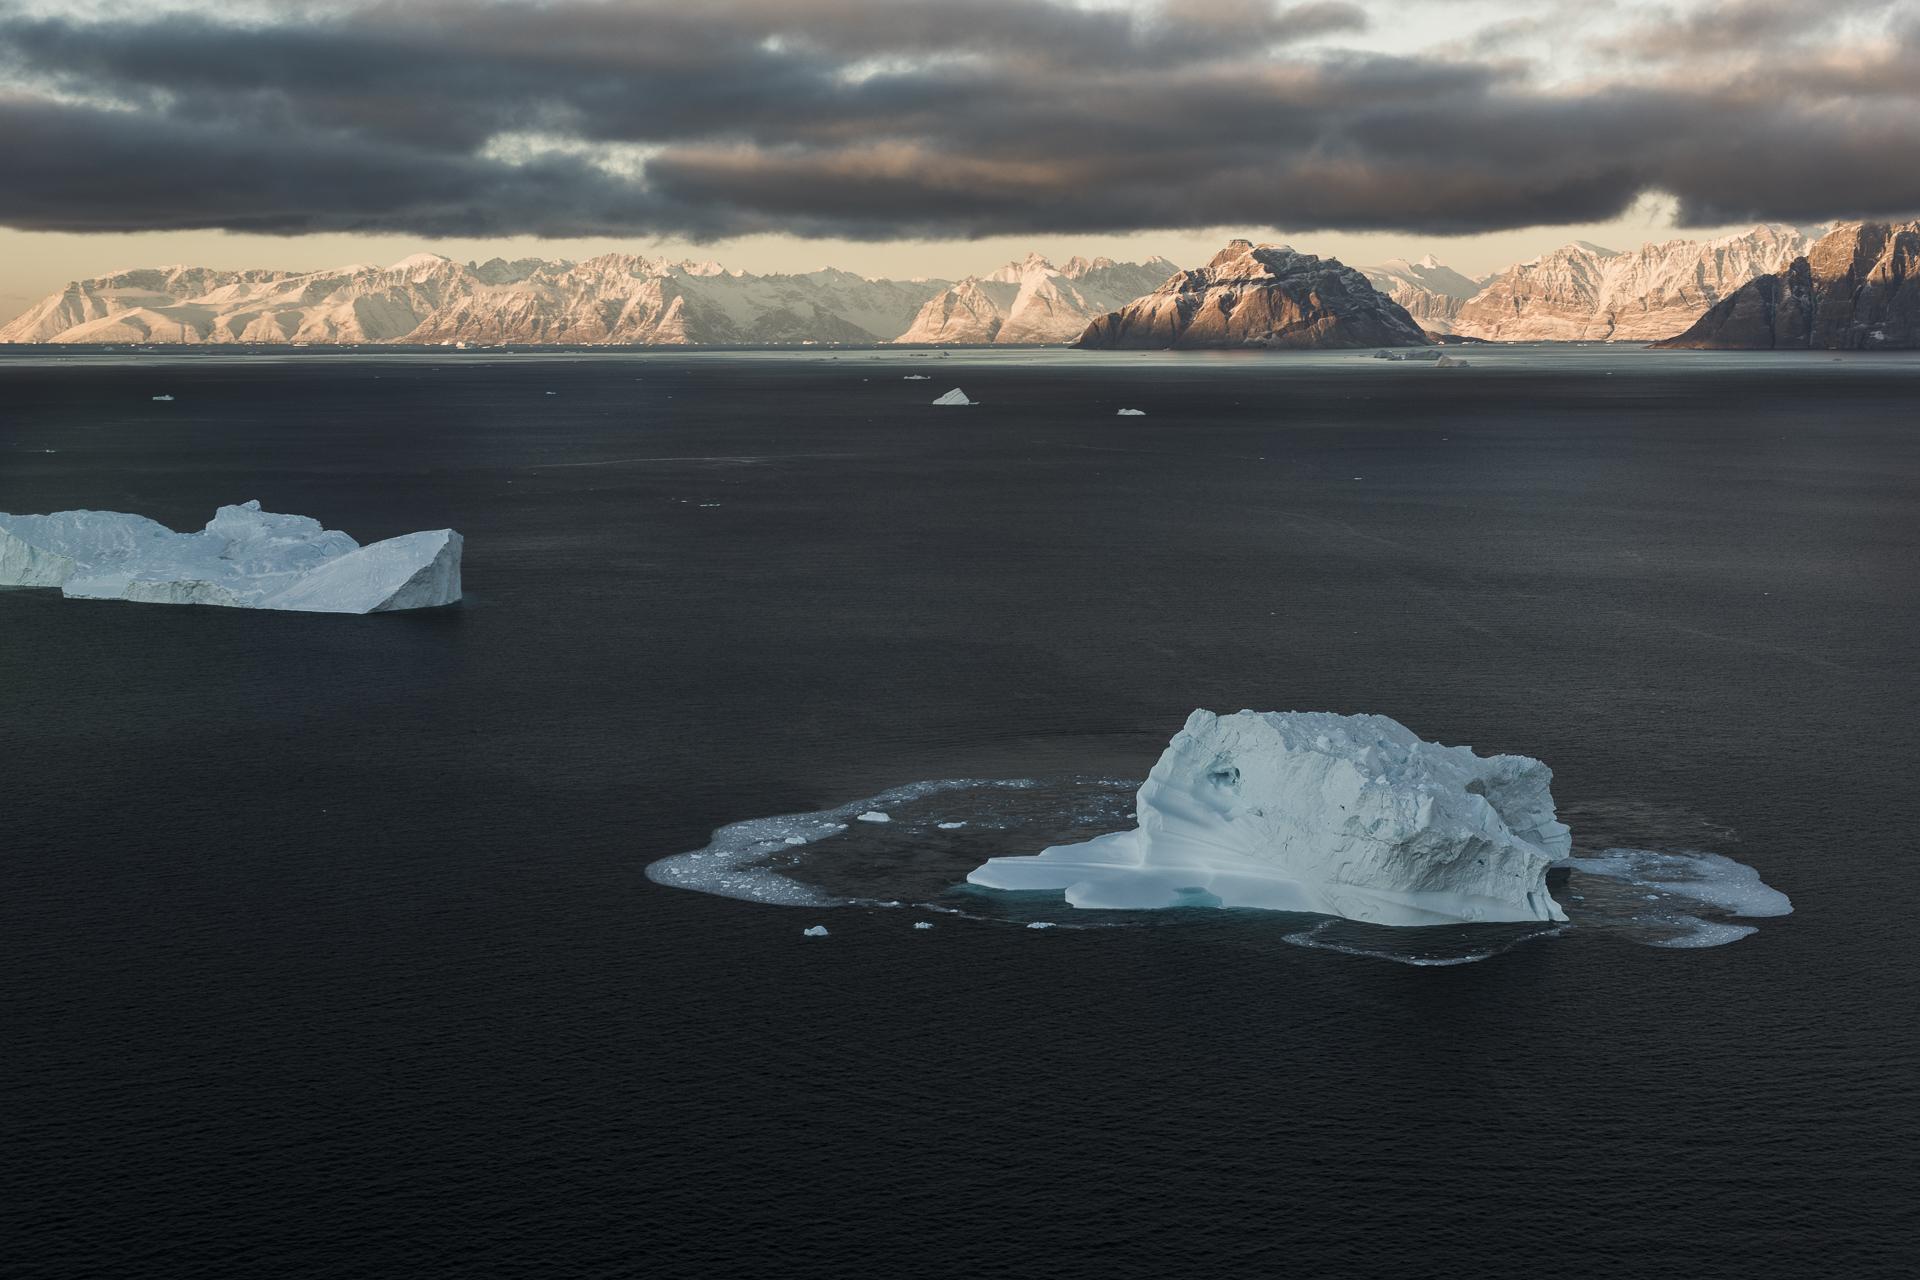 Defibaugh_Greenland_Uummannaq_a_136.jpg